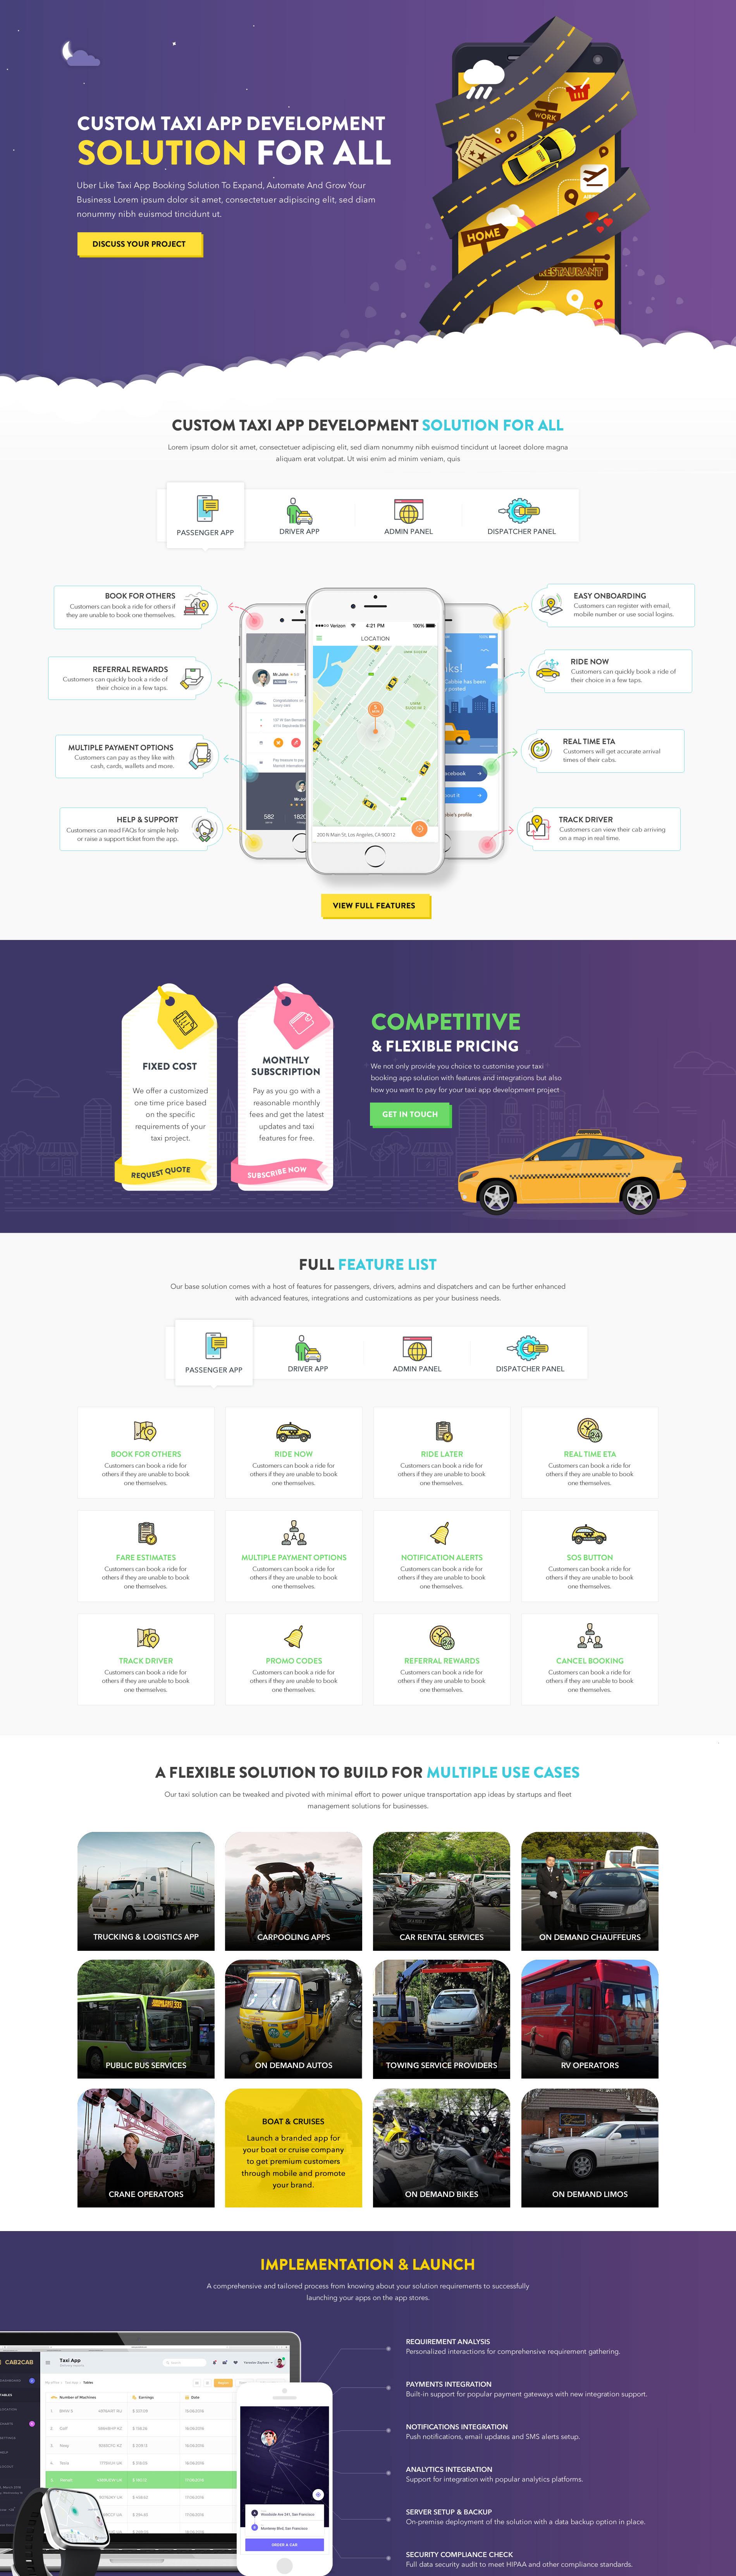 Taxi app development on Behance